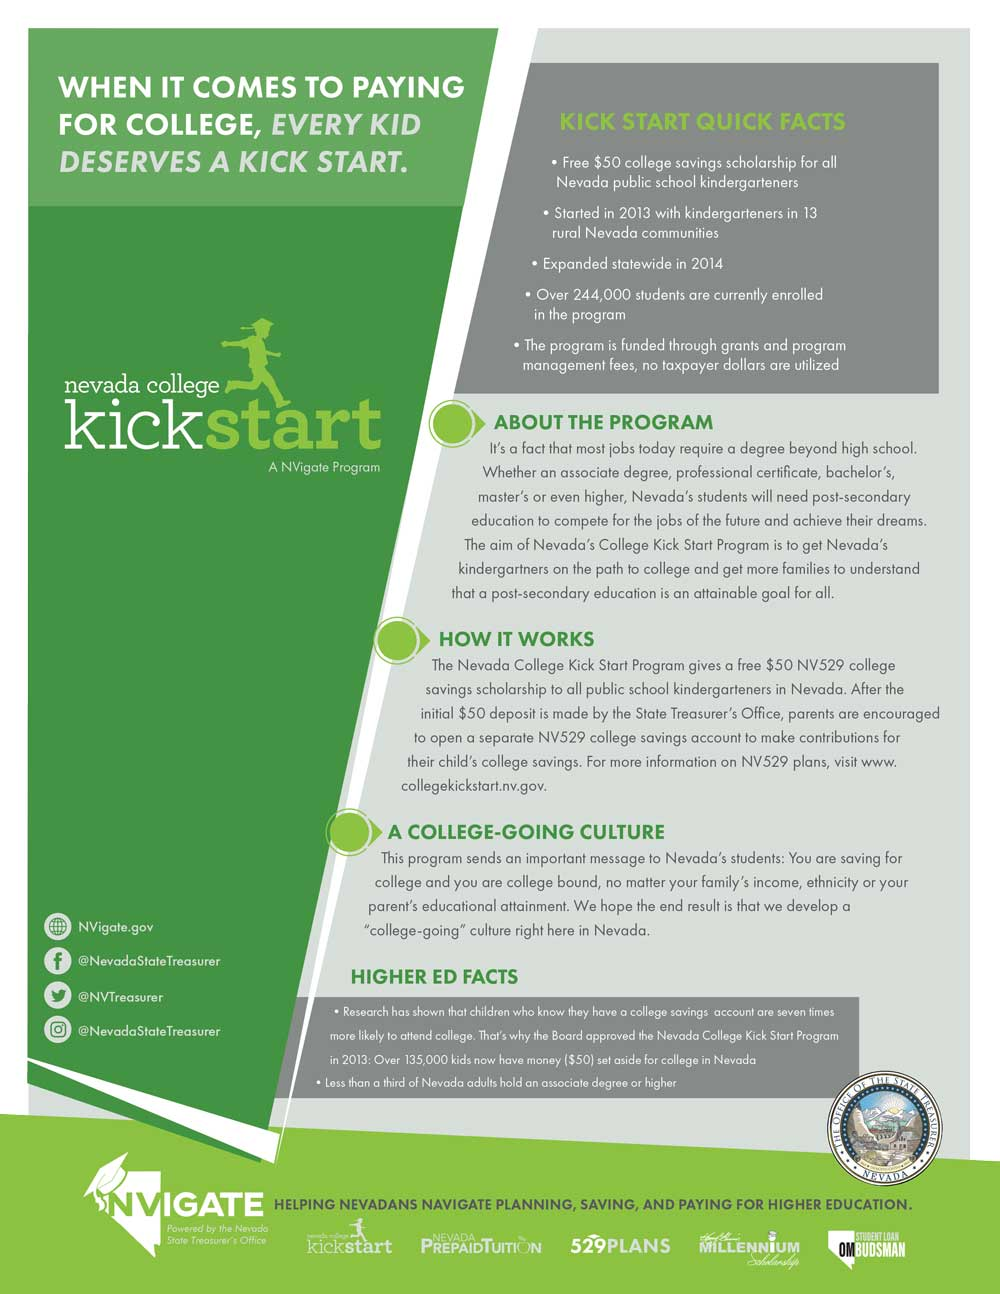 Nevada College Kick Start